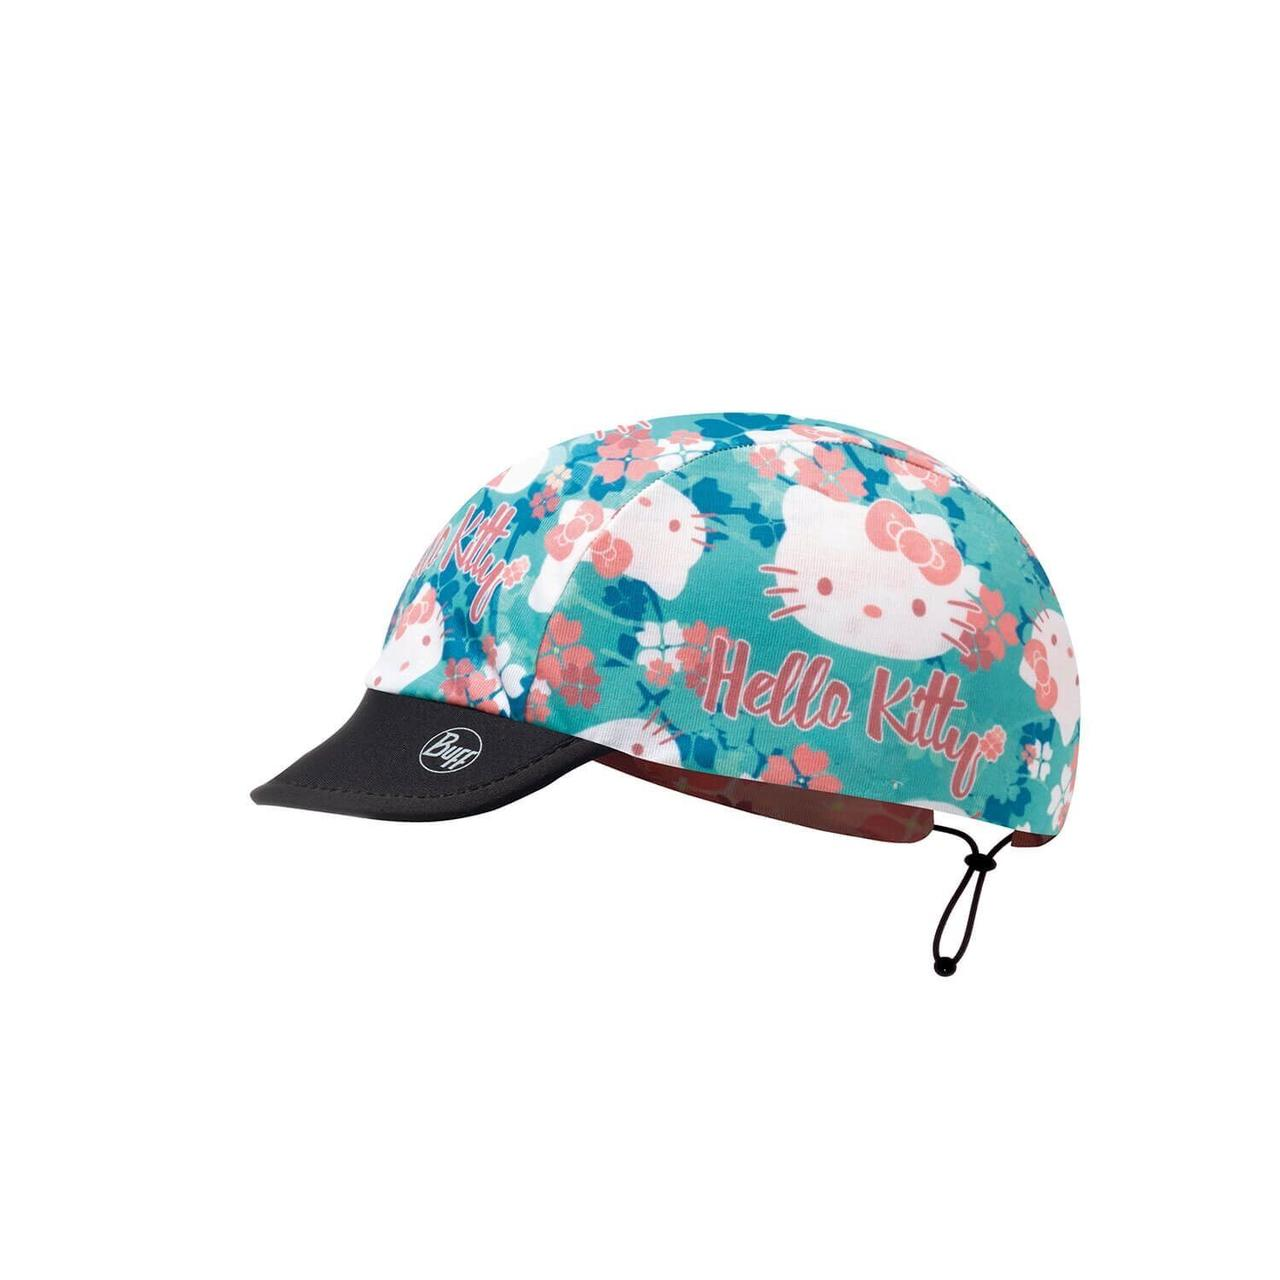 Кепка детская Buff Hello Kitty Cap, Aloha Kitty Multi